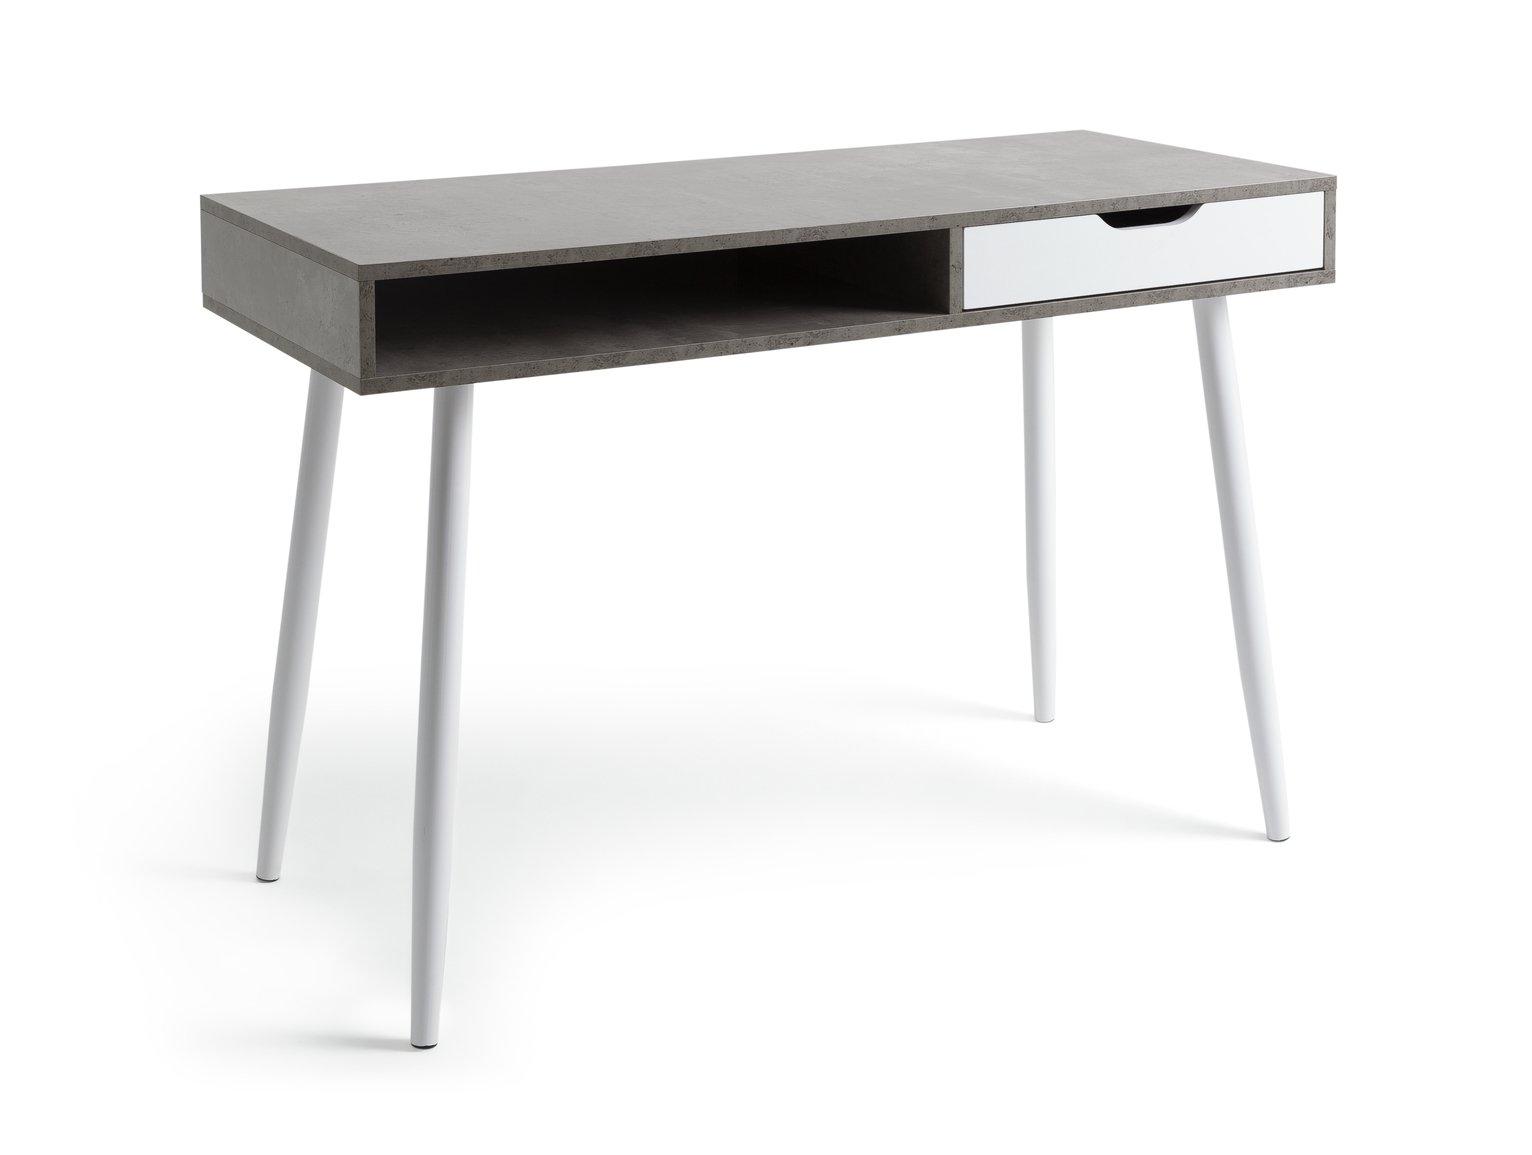 Buy Argos Home Concrete Style Office Desk | Desks | Argos